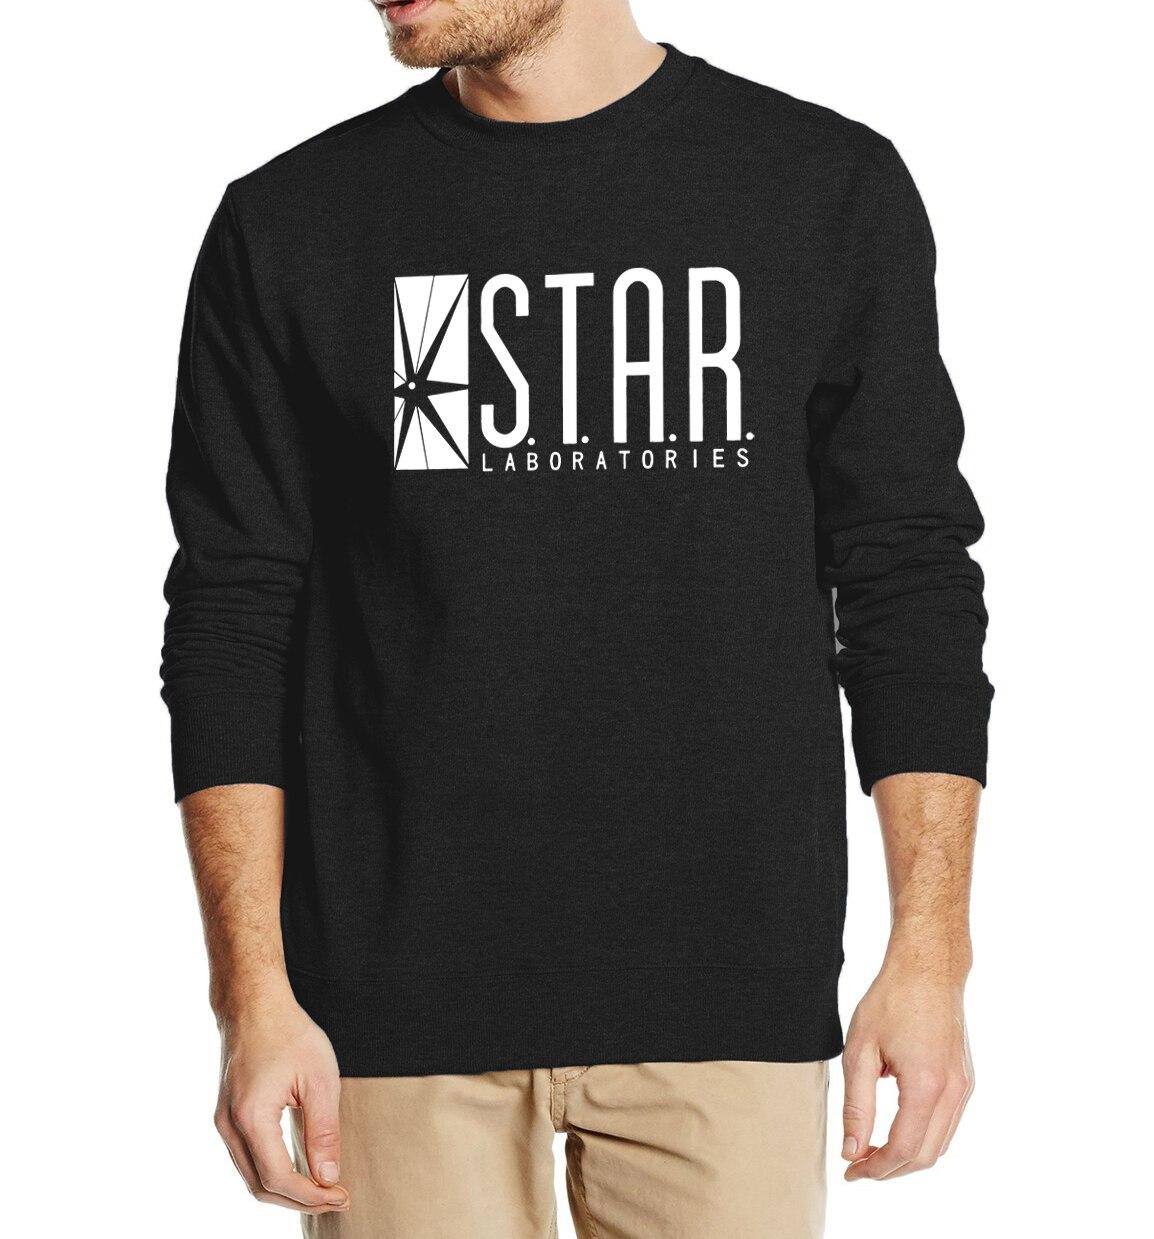 Superman Series Men Sweatshirt STAR S.T.A.R.labs Autumn Winter  2019 New Fashion Hoodies Cool Streetwear Tracksuit High Quality